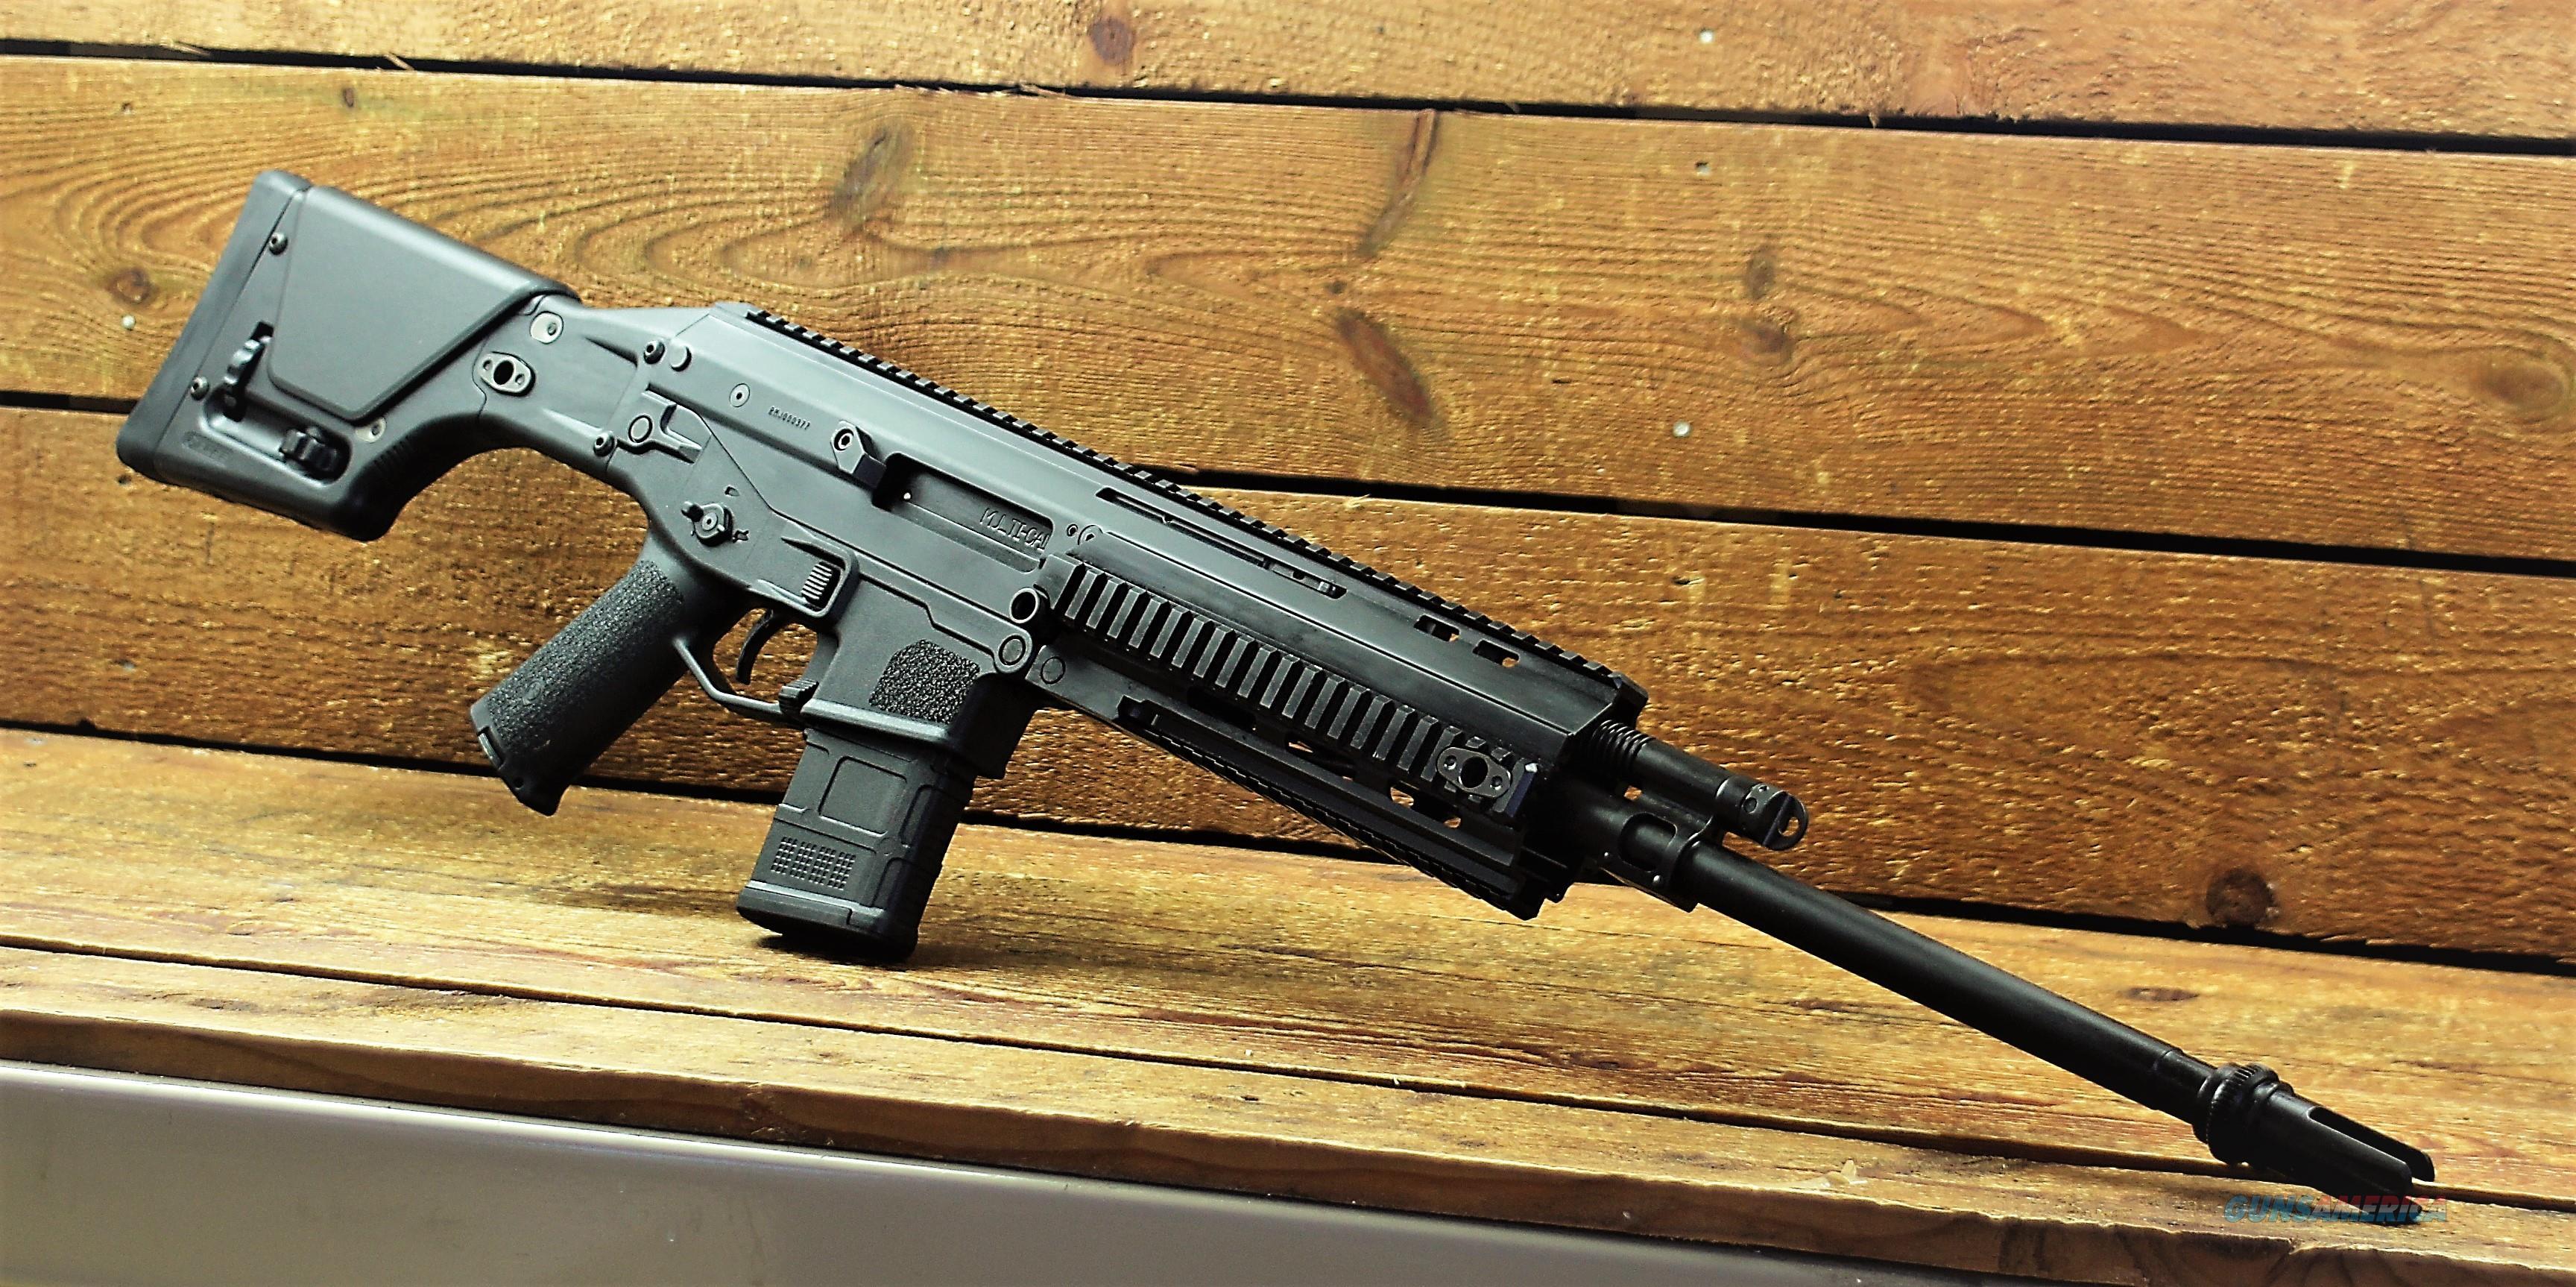 "$114  EZ PAY  Bushmaster ACR Adaptive Combat DMR Designated Marksman Rifle  military developed Ambidextrous controls Long Range precision Cold Hammer Forged Heavy 18.5"" BBL  TWIST 1:7""  picatinny rail  20 Rd Magpul PRS2 Stock 90958  Guns > Rifles > Bushmaster Rifles > Complete Rifles"